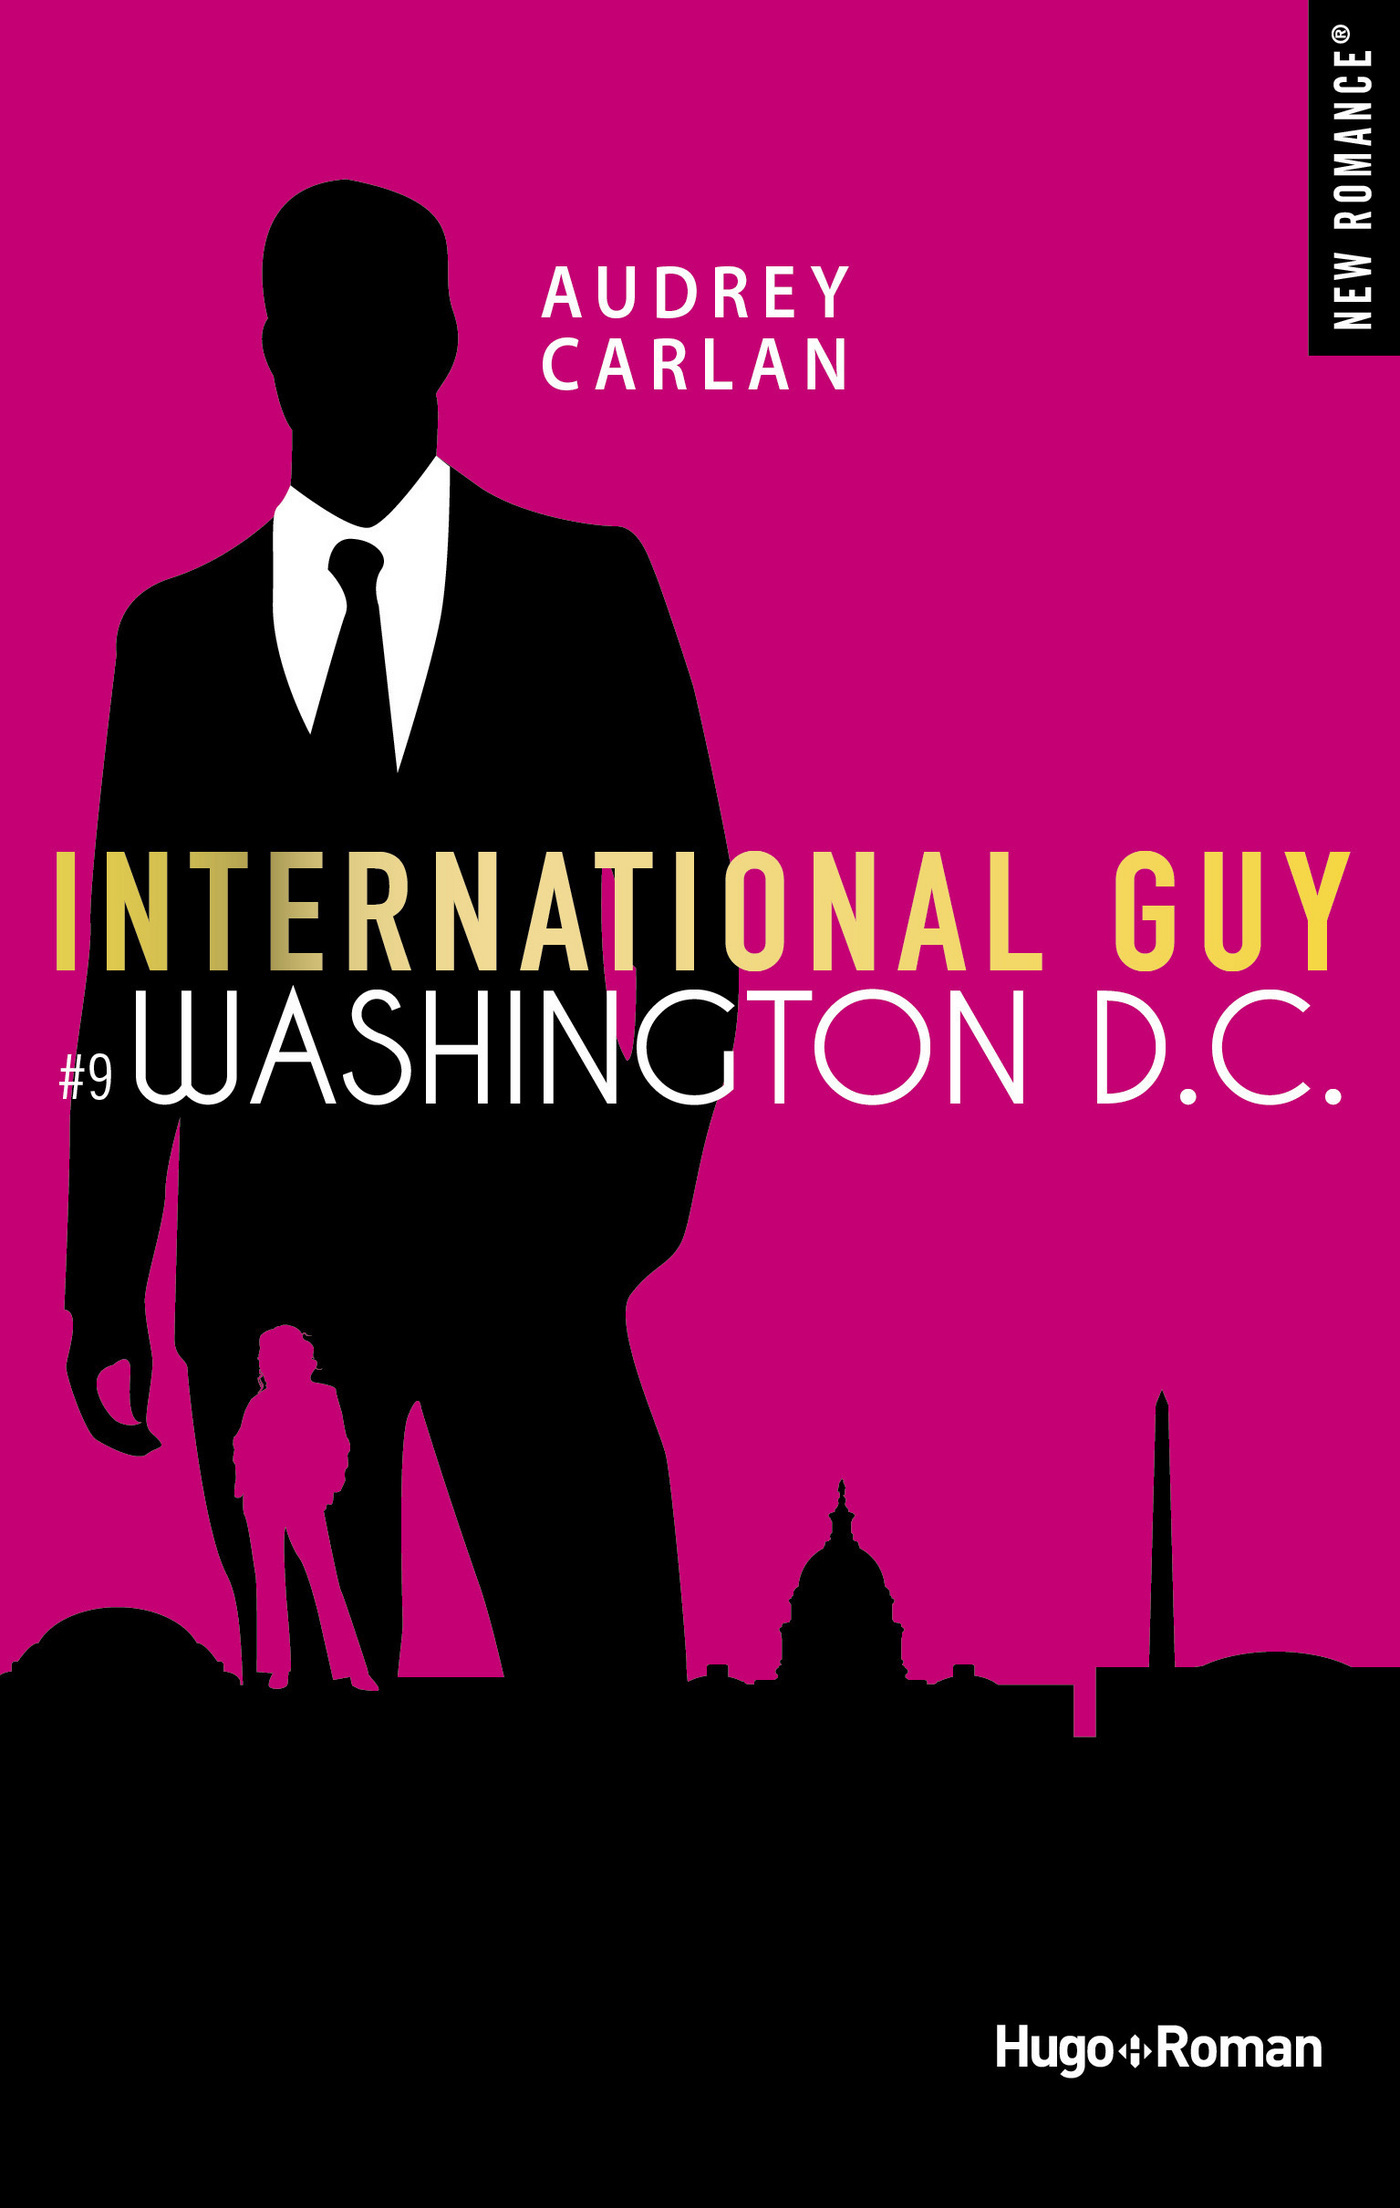 International Guy - tome 9 Washington DC -Extrait offert-